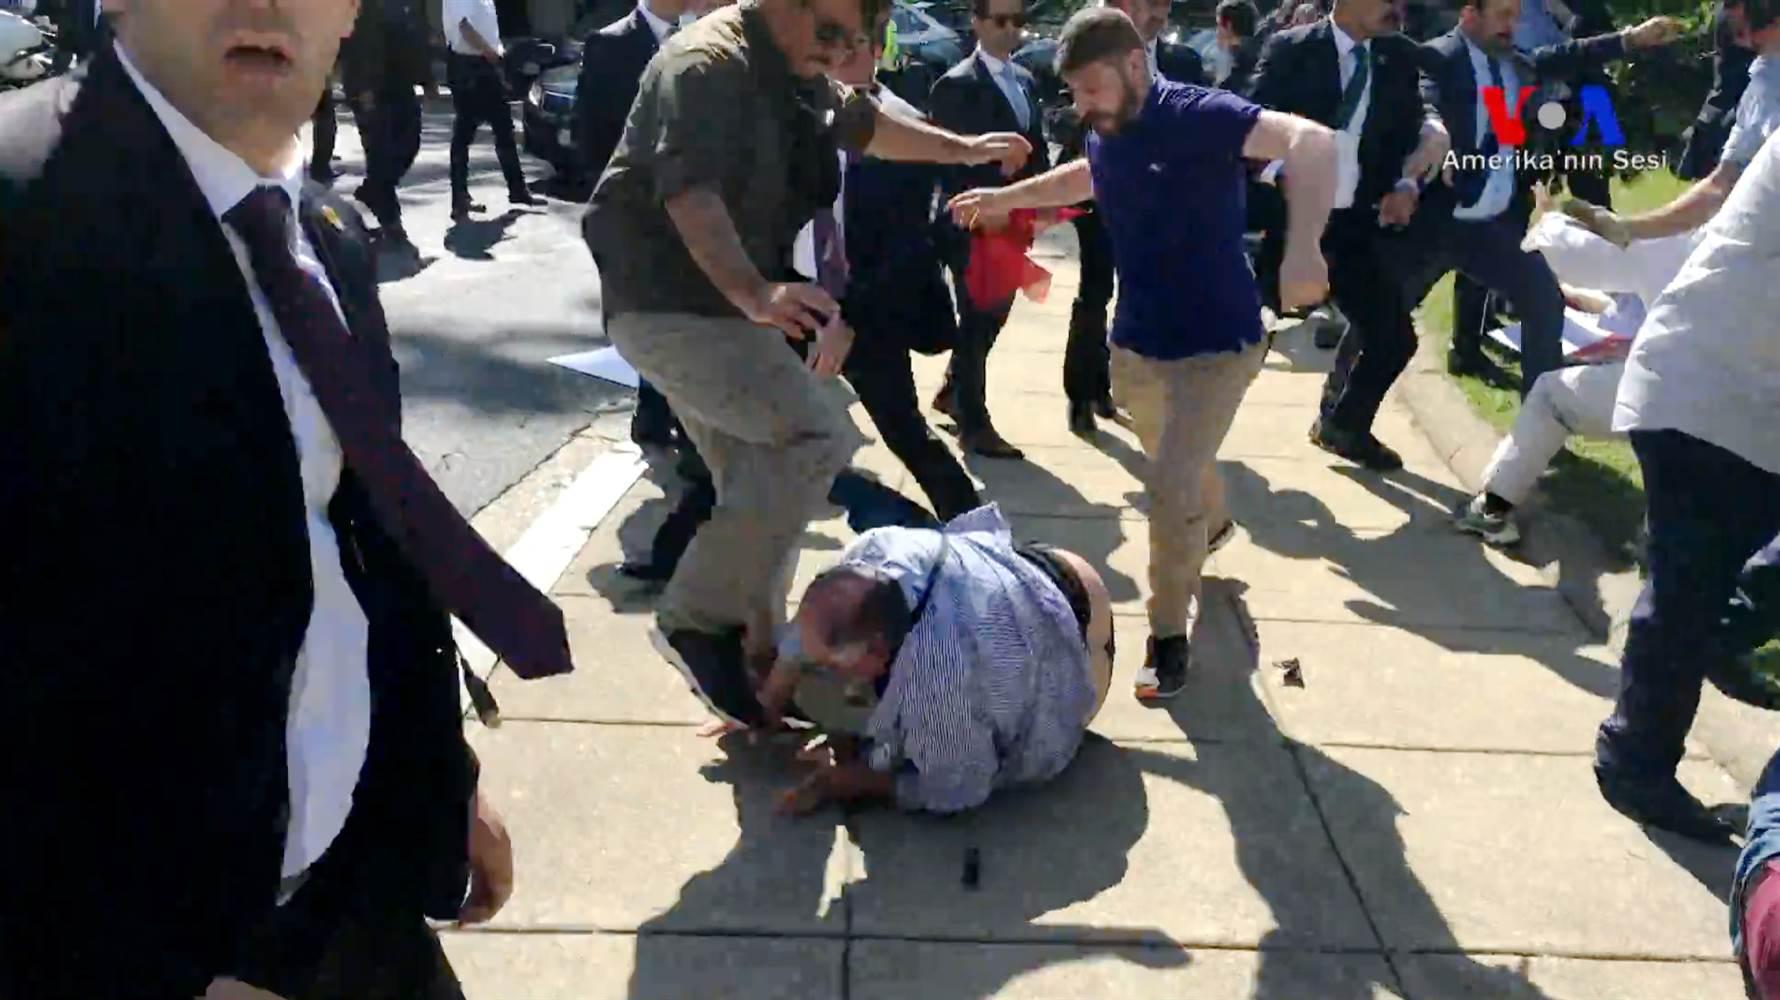 170517-turkey-protests-violence-njs-1243p_f7bea3e445b7034cb9f6301a42f3afef.nbcnews-ux-2880-1000.jpg